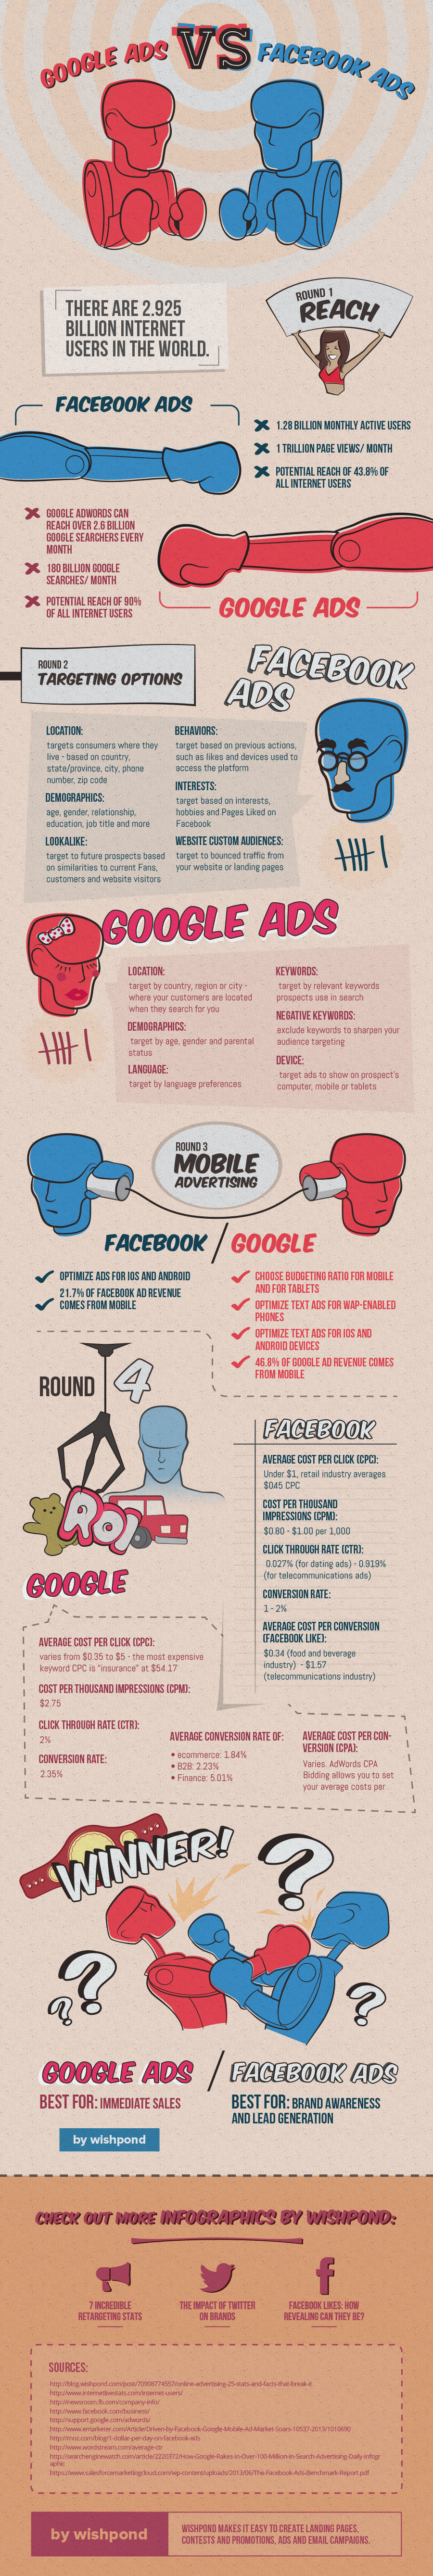 Google Adwords vs Facebook Ads - INFOGRAFIA